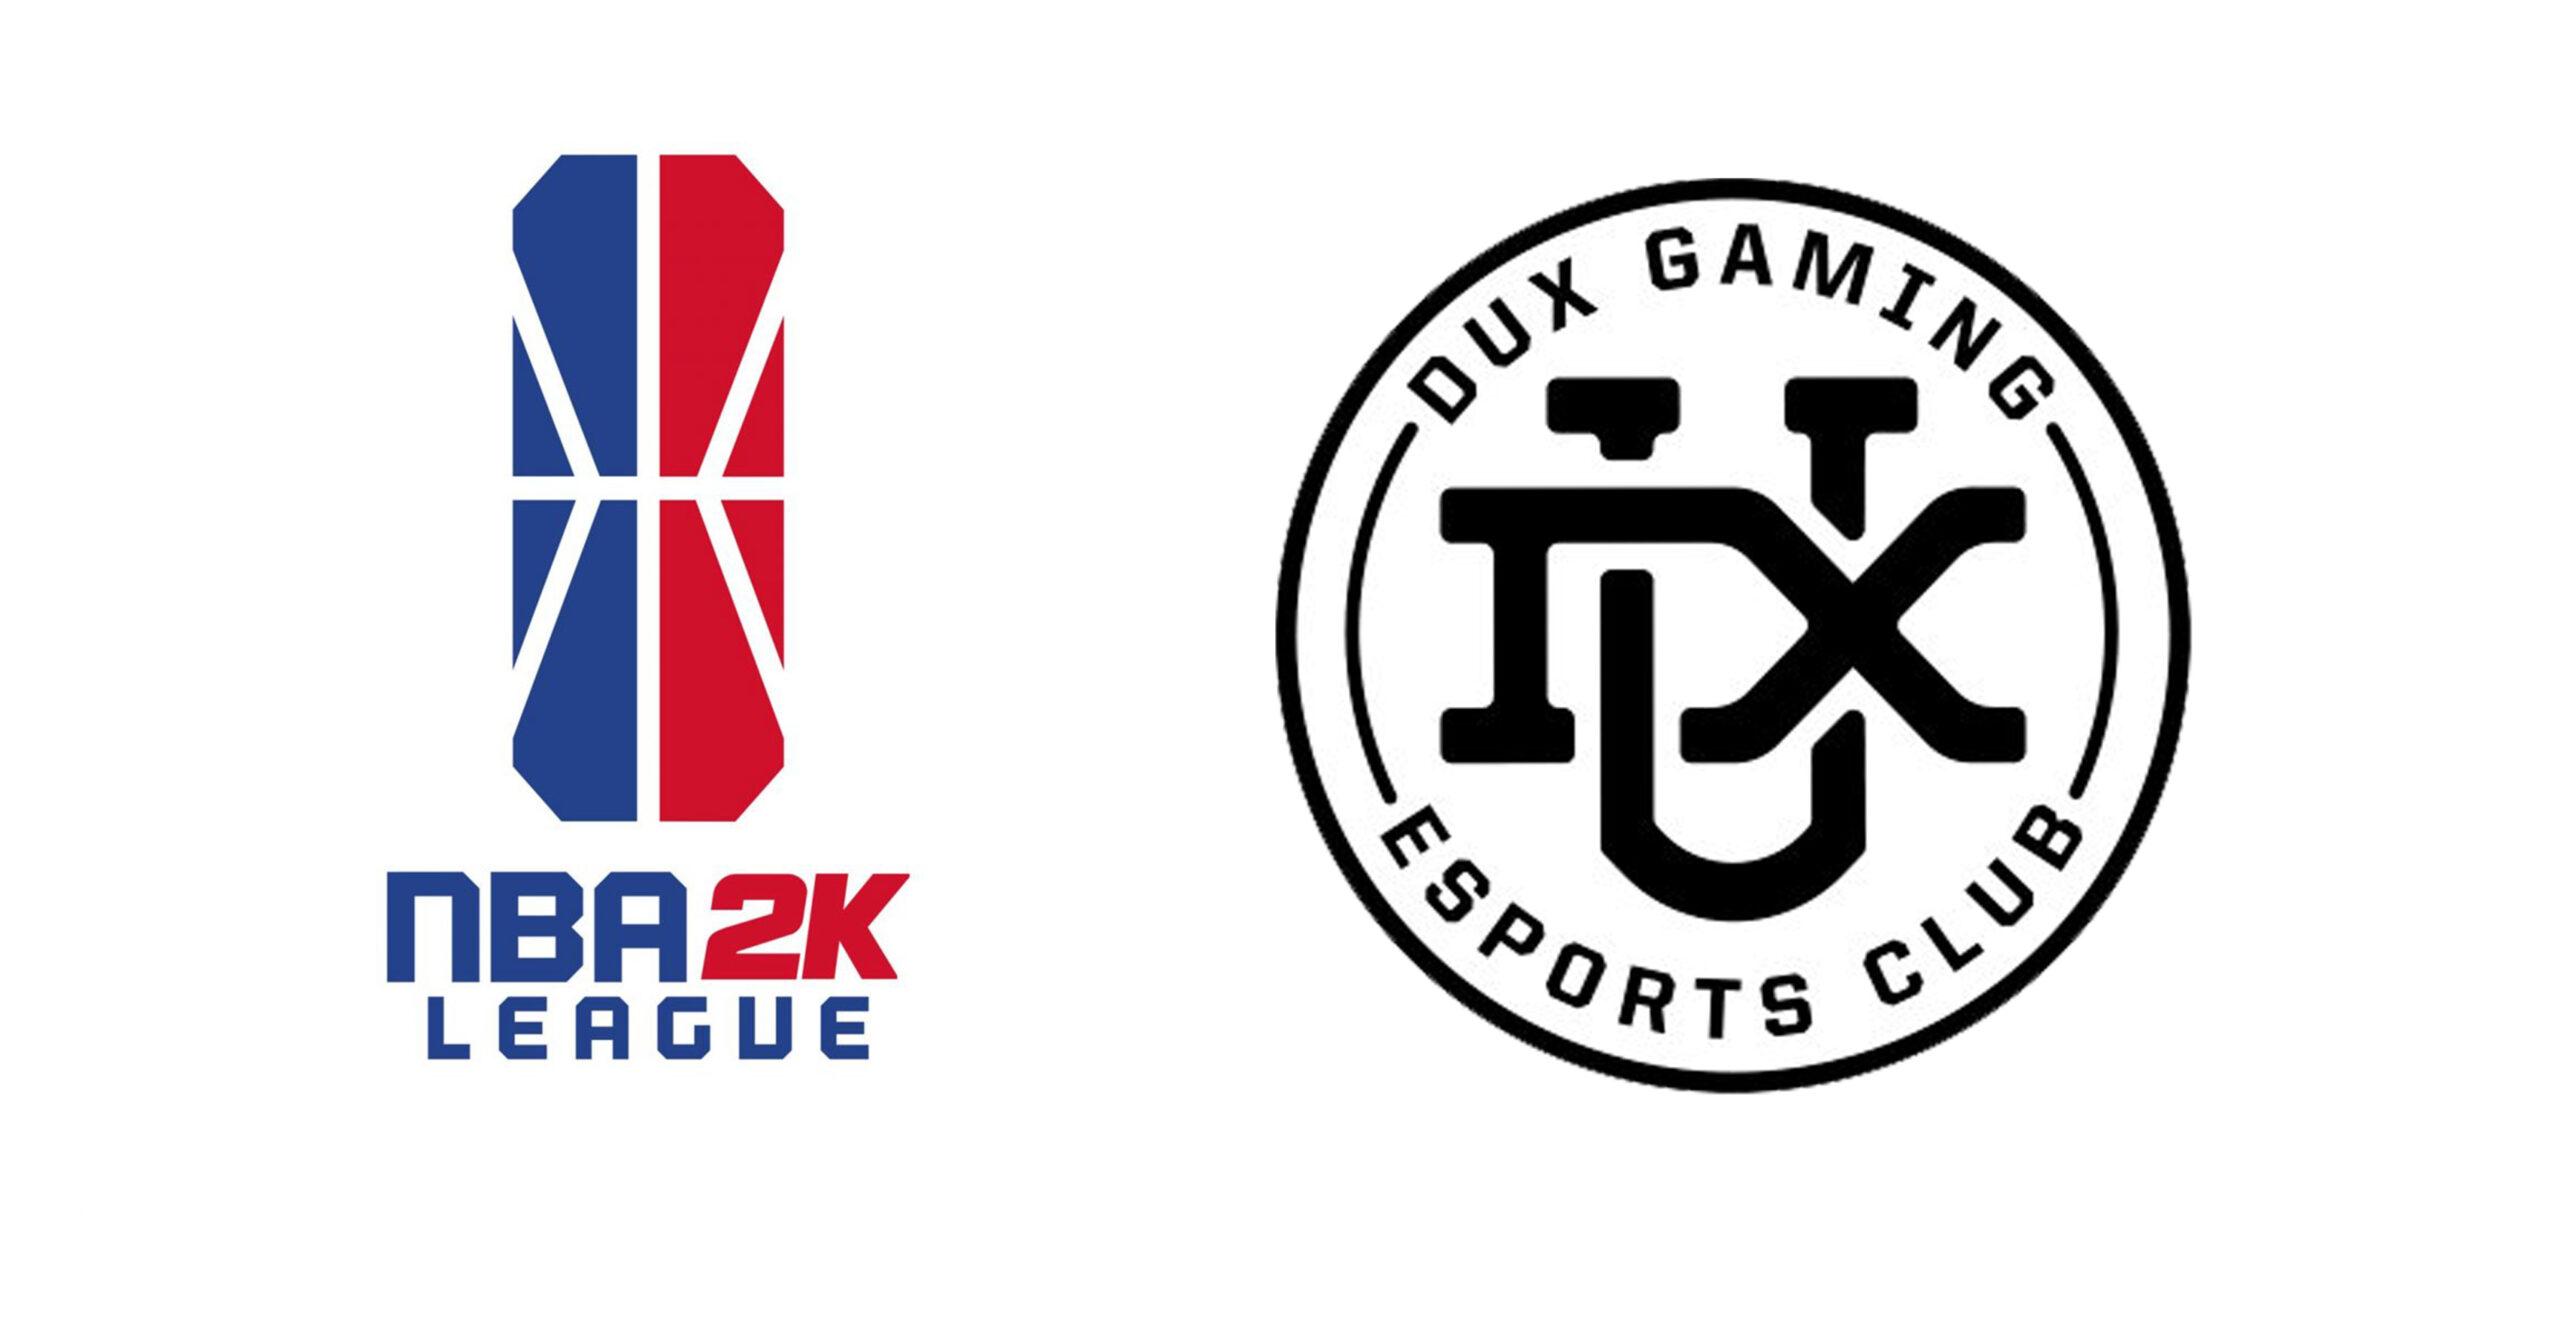 La NBA 2K League se suma a México y suma su 24 equipo en asociación con DUX Gaming, GamersRD